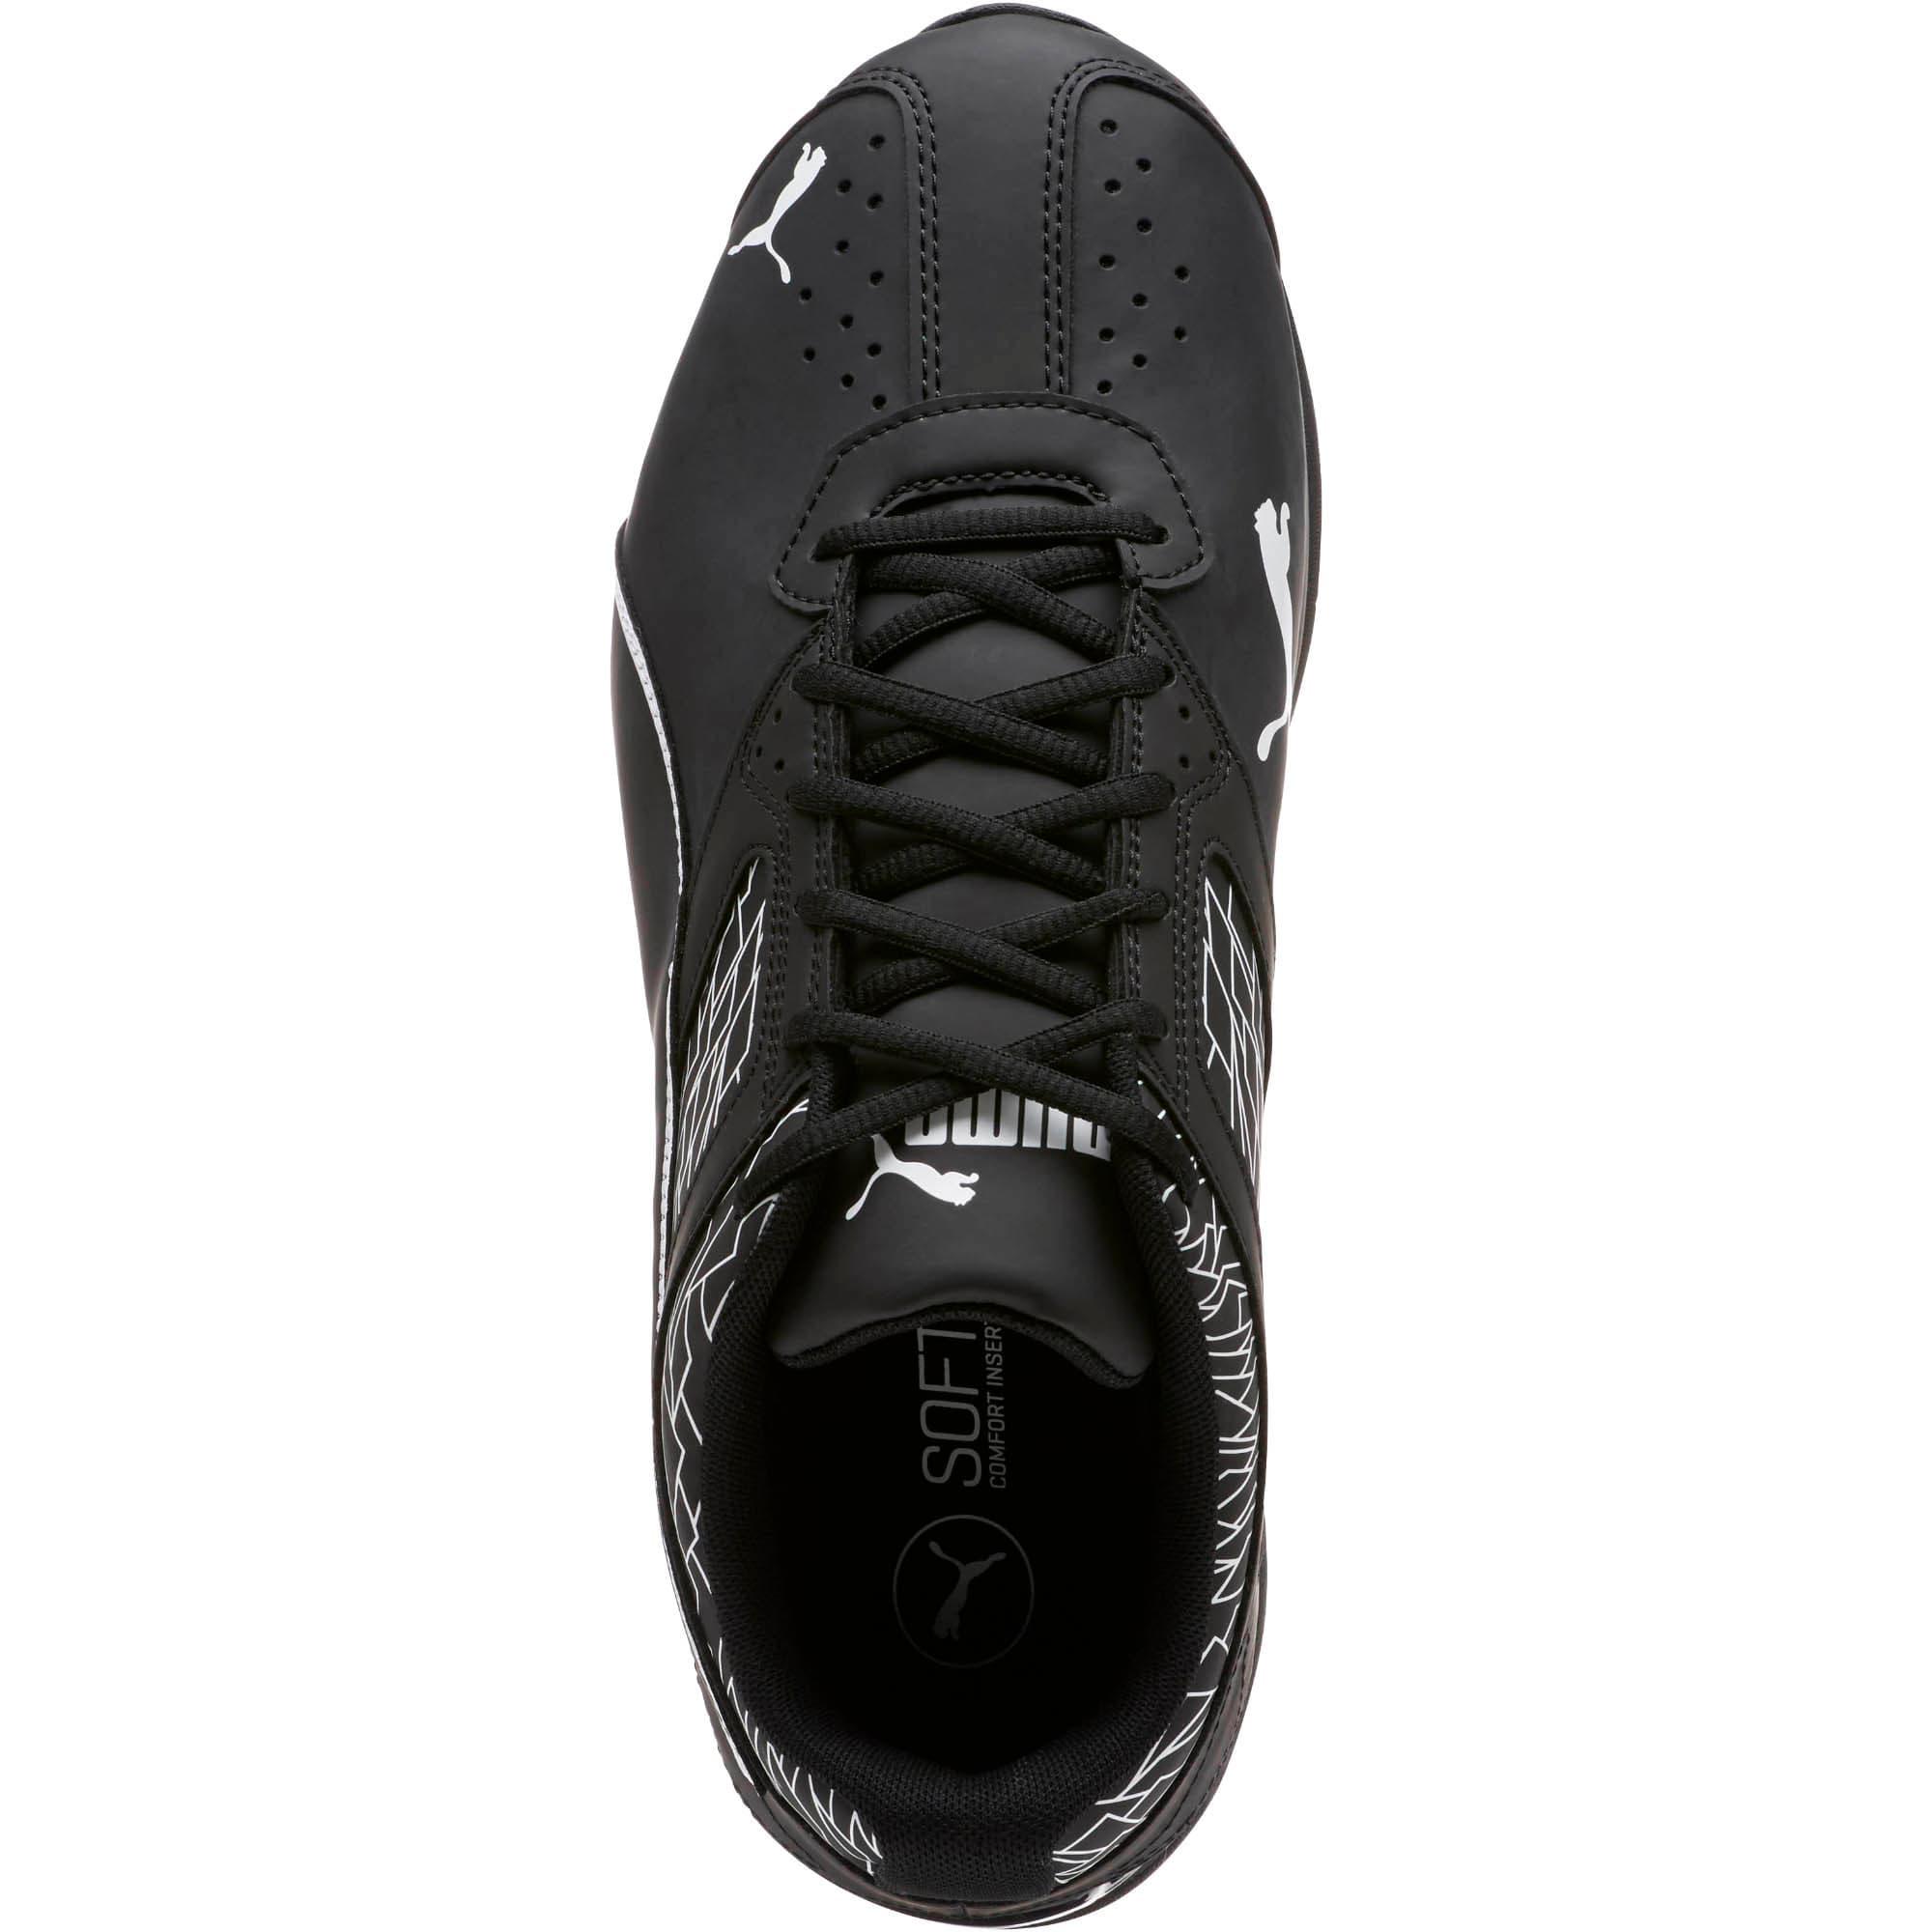 Thumbnail 5 of Tazon 6 Fracture FM Wide Men's Sneakers, Puma Black-Puma Black, medium